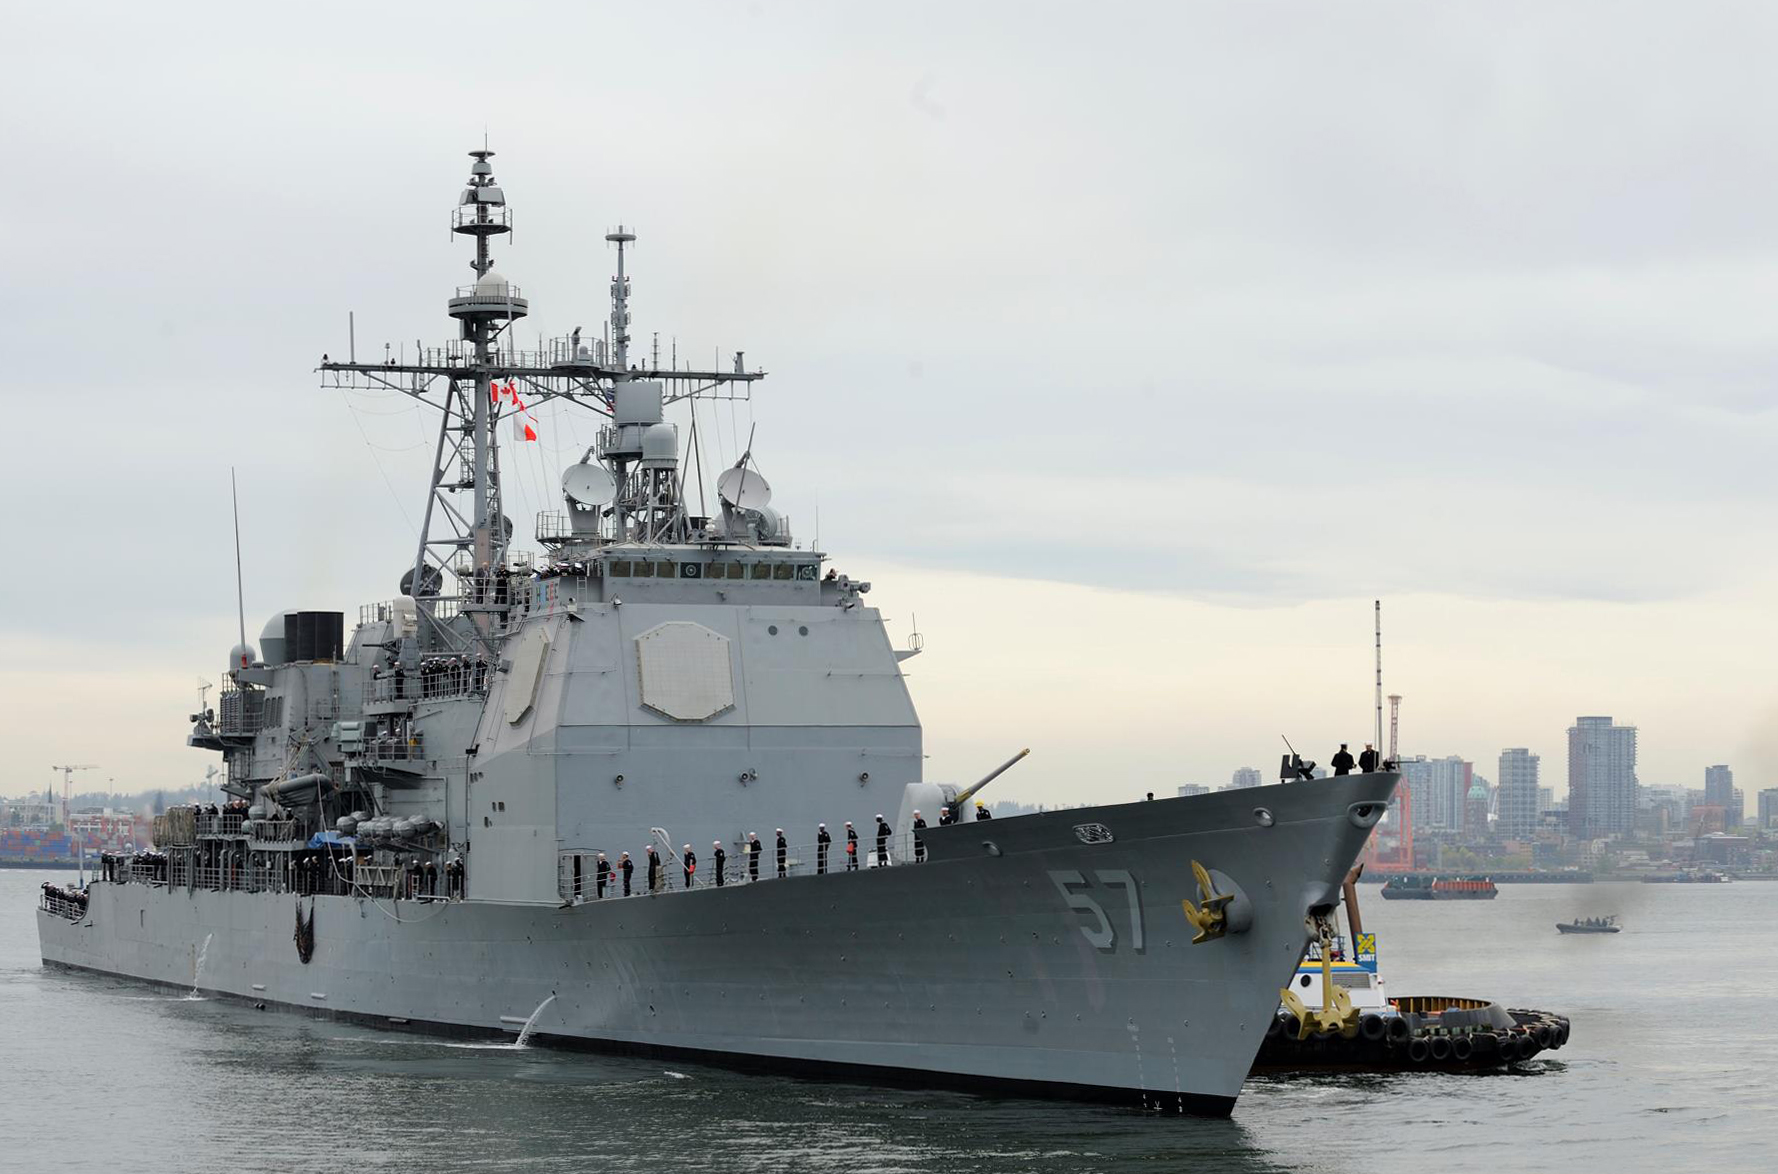 USS LAKE CHAMPLAIN CG-57 Vancouver, Kanada 26.04.2013Bild: U.S. Navy